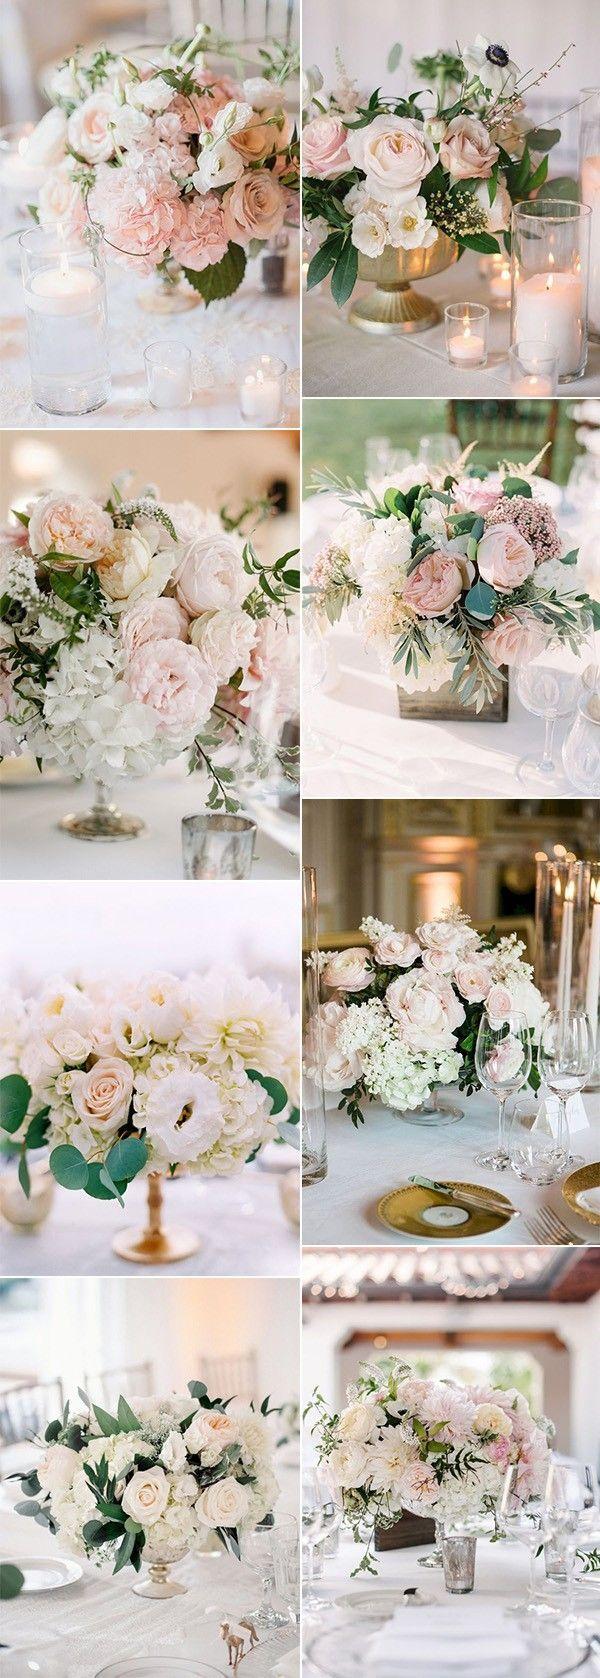 15 Elegant Blush Pink Wedding Centerpieces for 2019